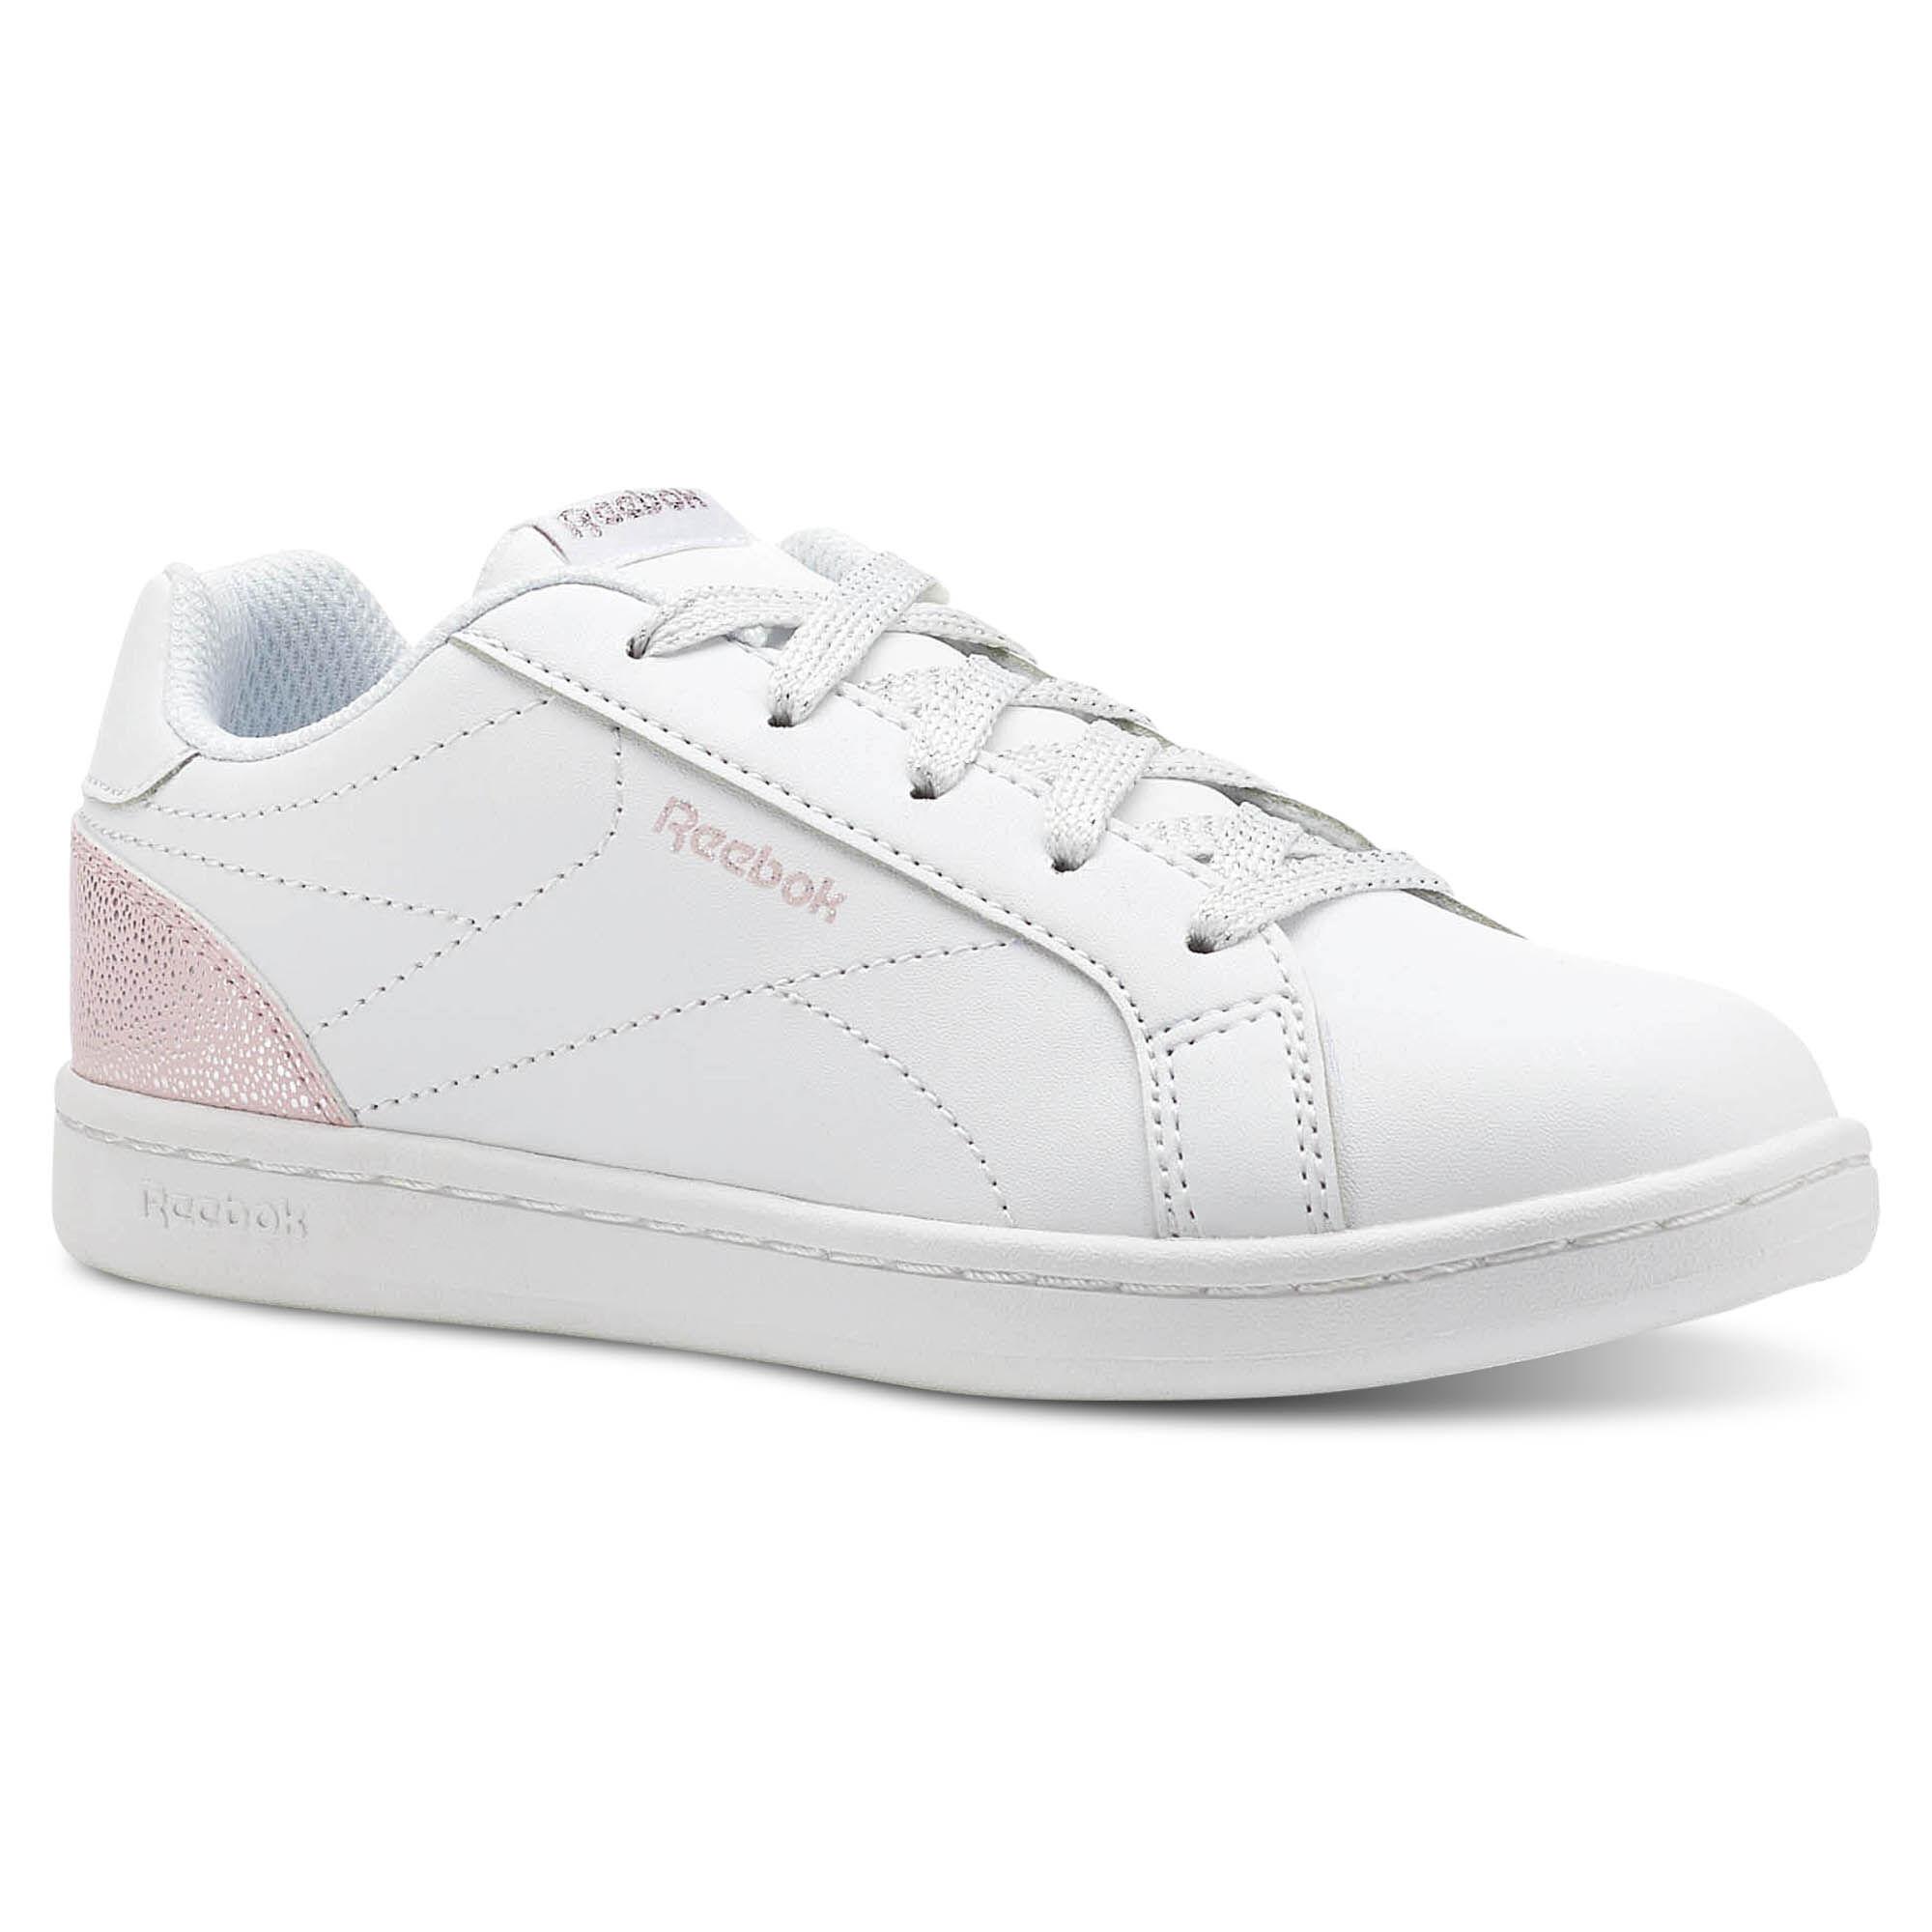 Schuhe Reebok - Royal Complete Cln CN5071 Pastel Wht/Pink/Silver zSCV1I7kYH